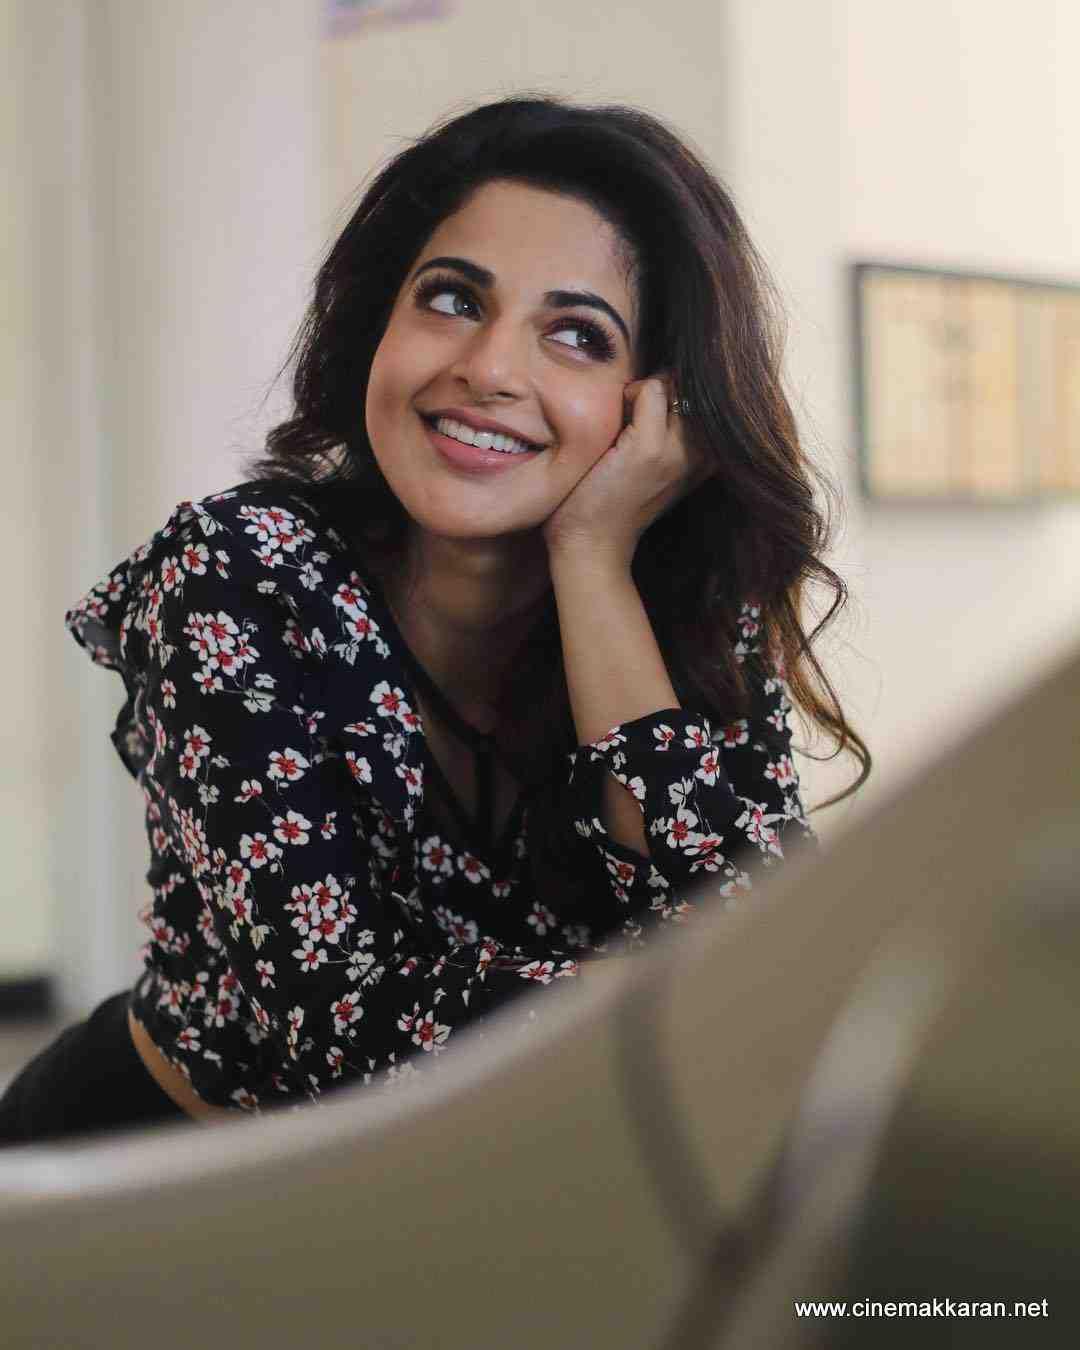 Iswarya Menon Stills Indian Actress Photos Blouse Design Models Actress Photos Akshara menon hot pics wallpapers images